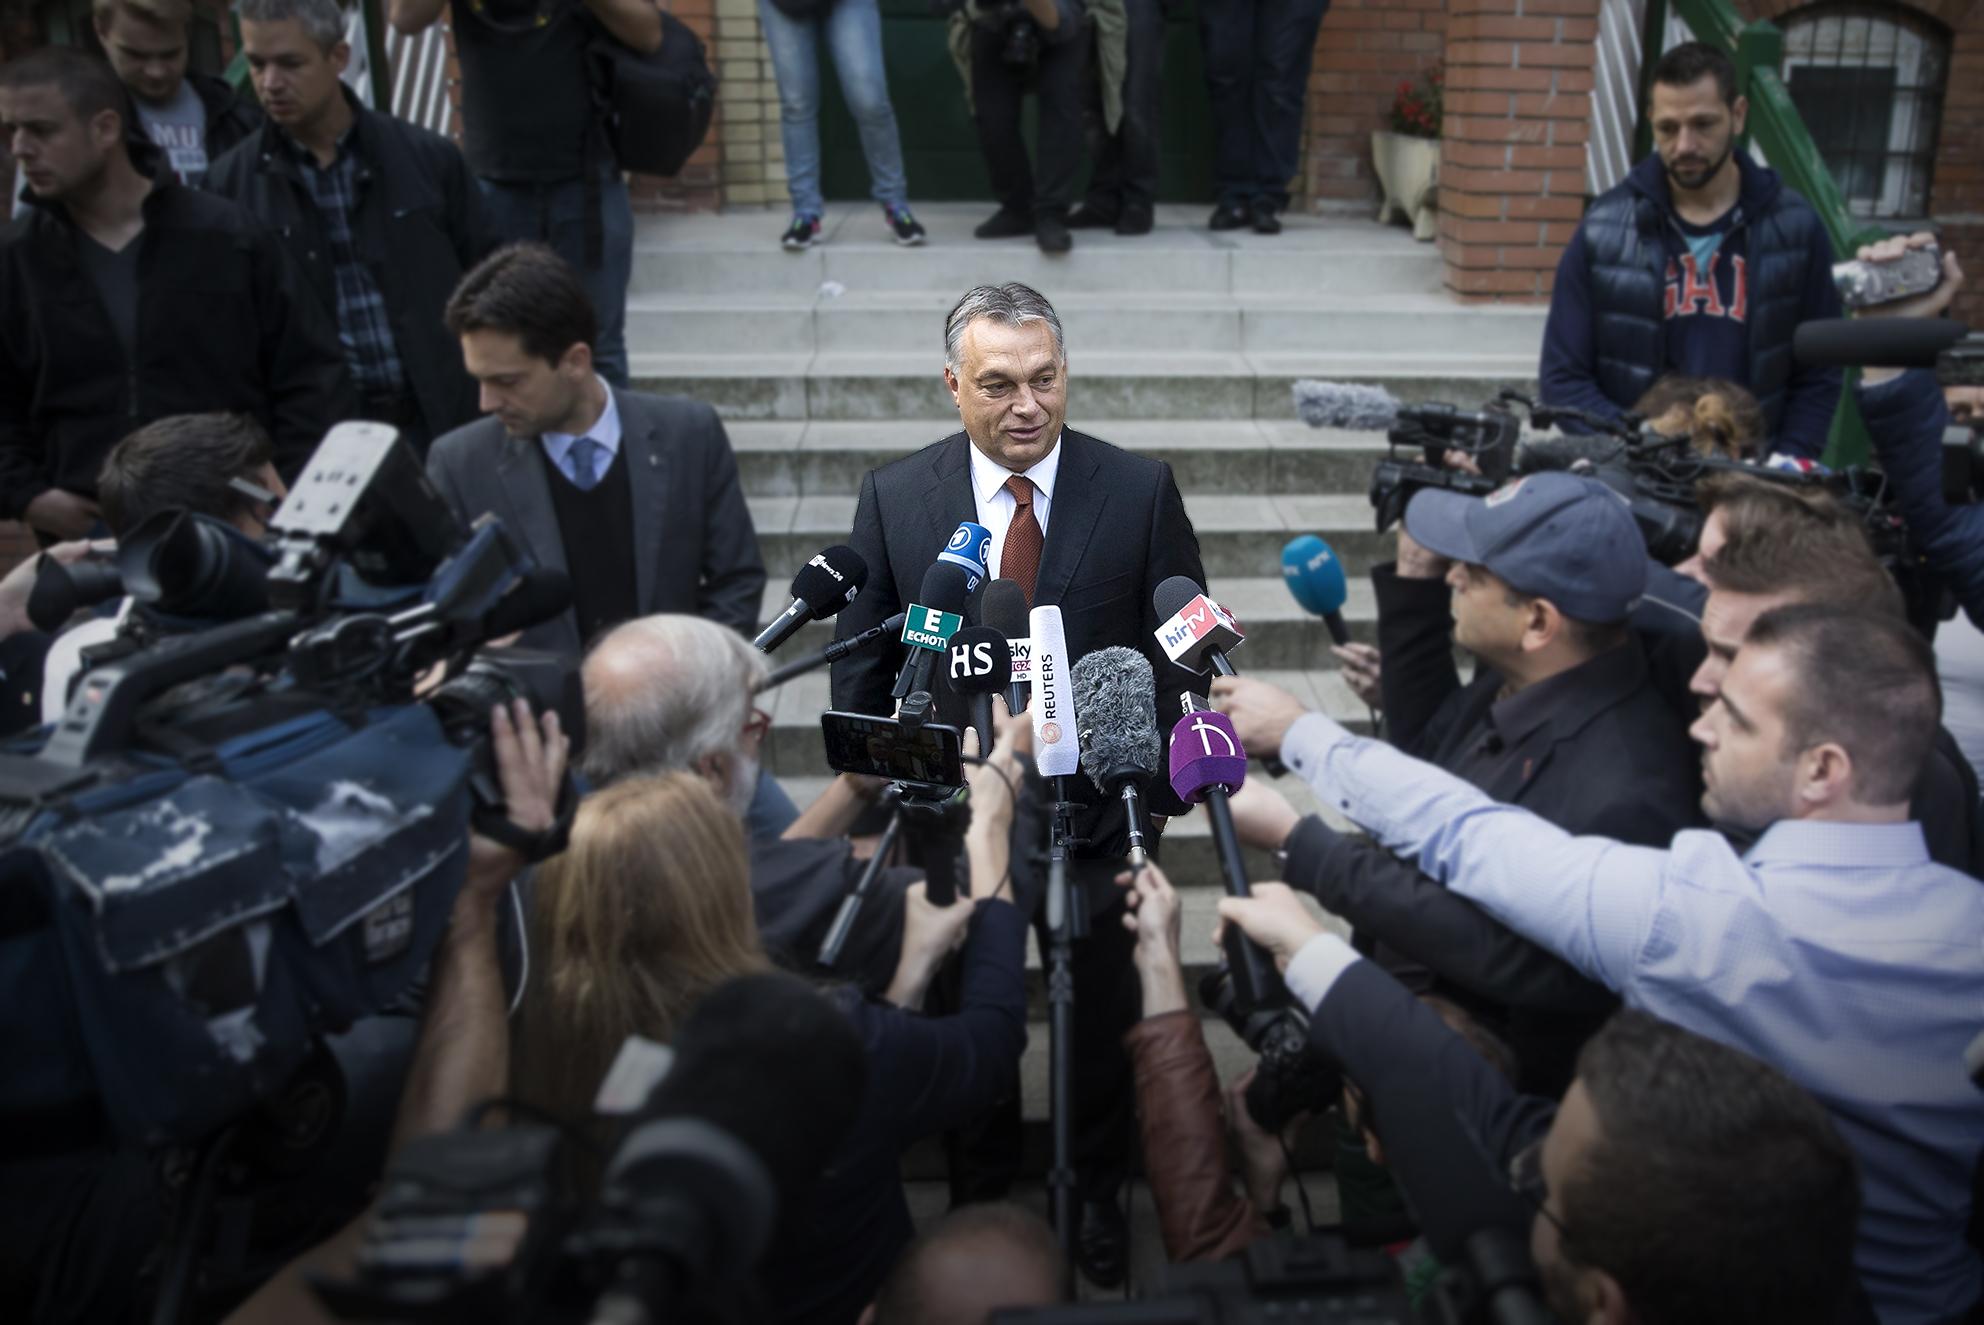 A hagyományos autokrácia a Terminátor, Orbánék már a Terminátor 2